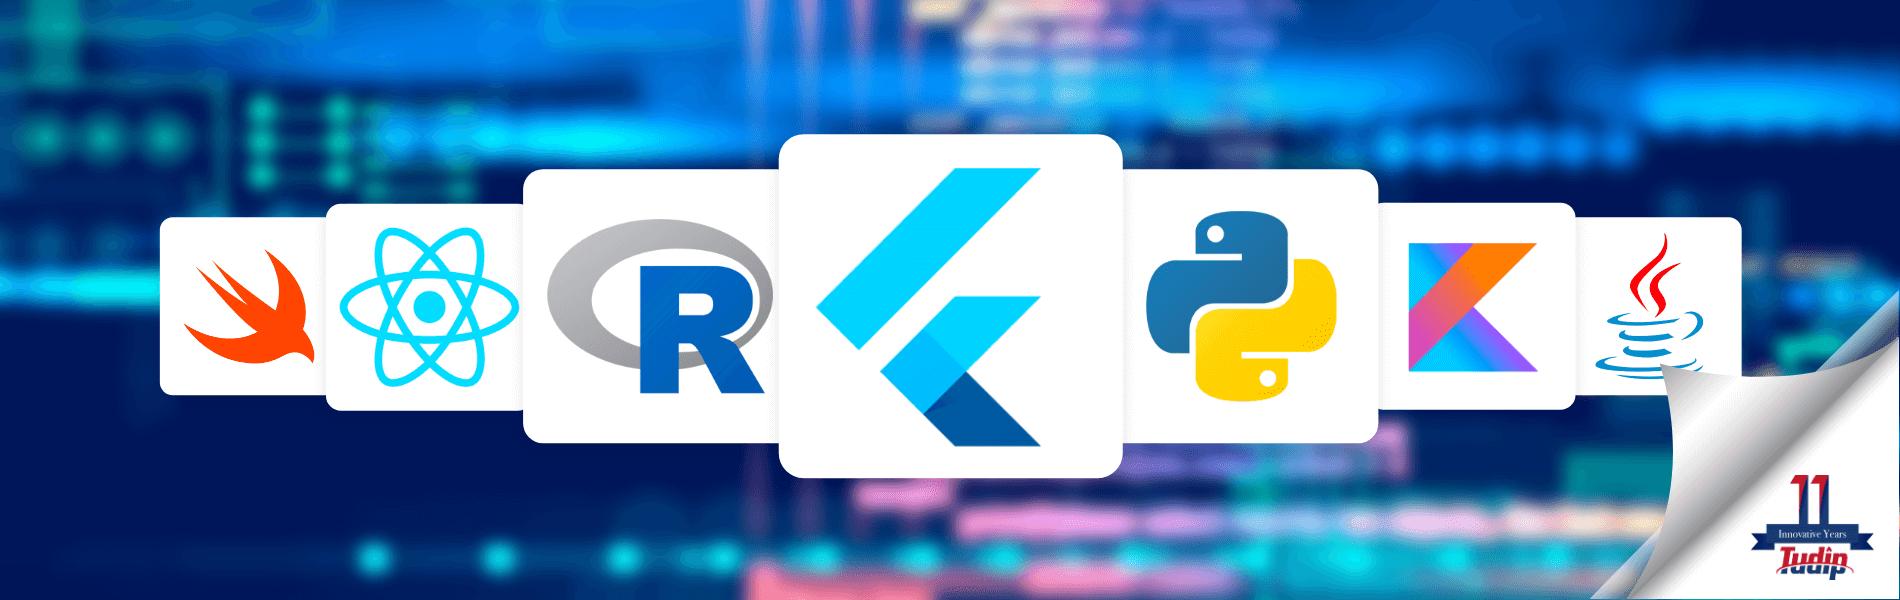 7 Best Mobile App Development Technologies Designed for Startup's Growth